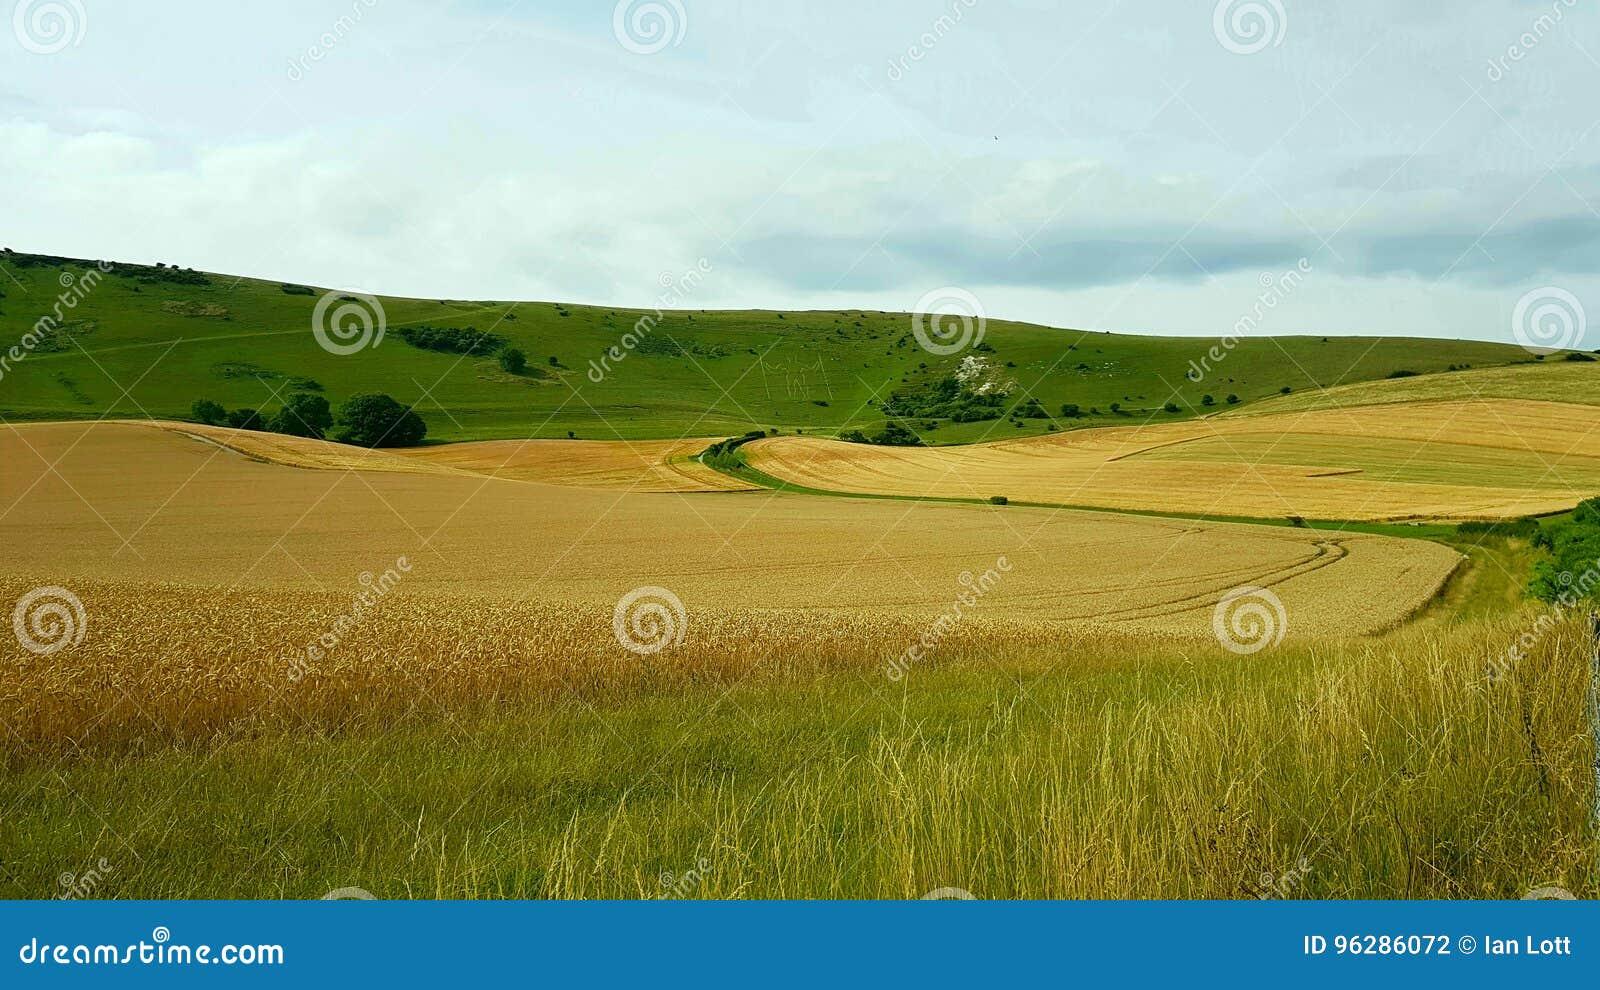 WilmingtonÂ的TheÂ长的人是aÂ在Windover小山nearÂ威明顿,东萨塞克斯郡,英国陡坡的小山figureÂ